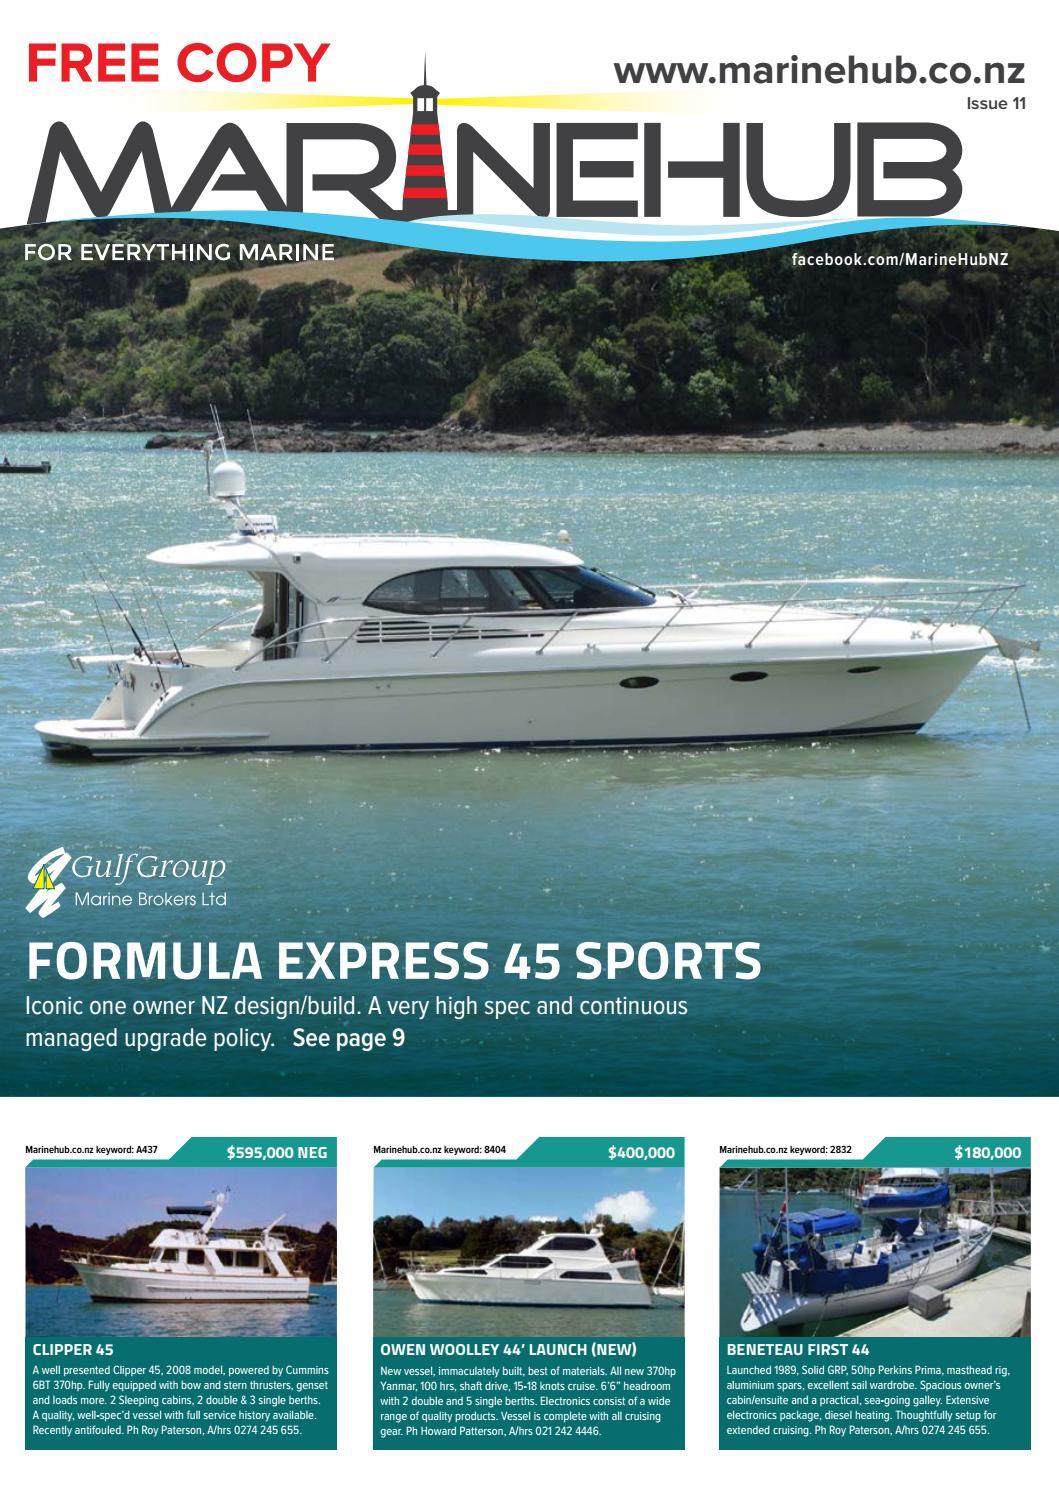 Marine Hub Magazine Issue 11 by The Marine Hub - issuu